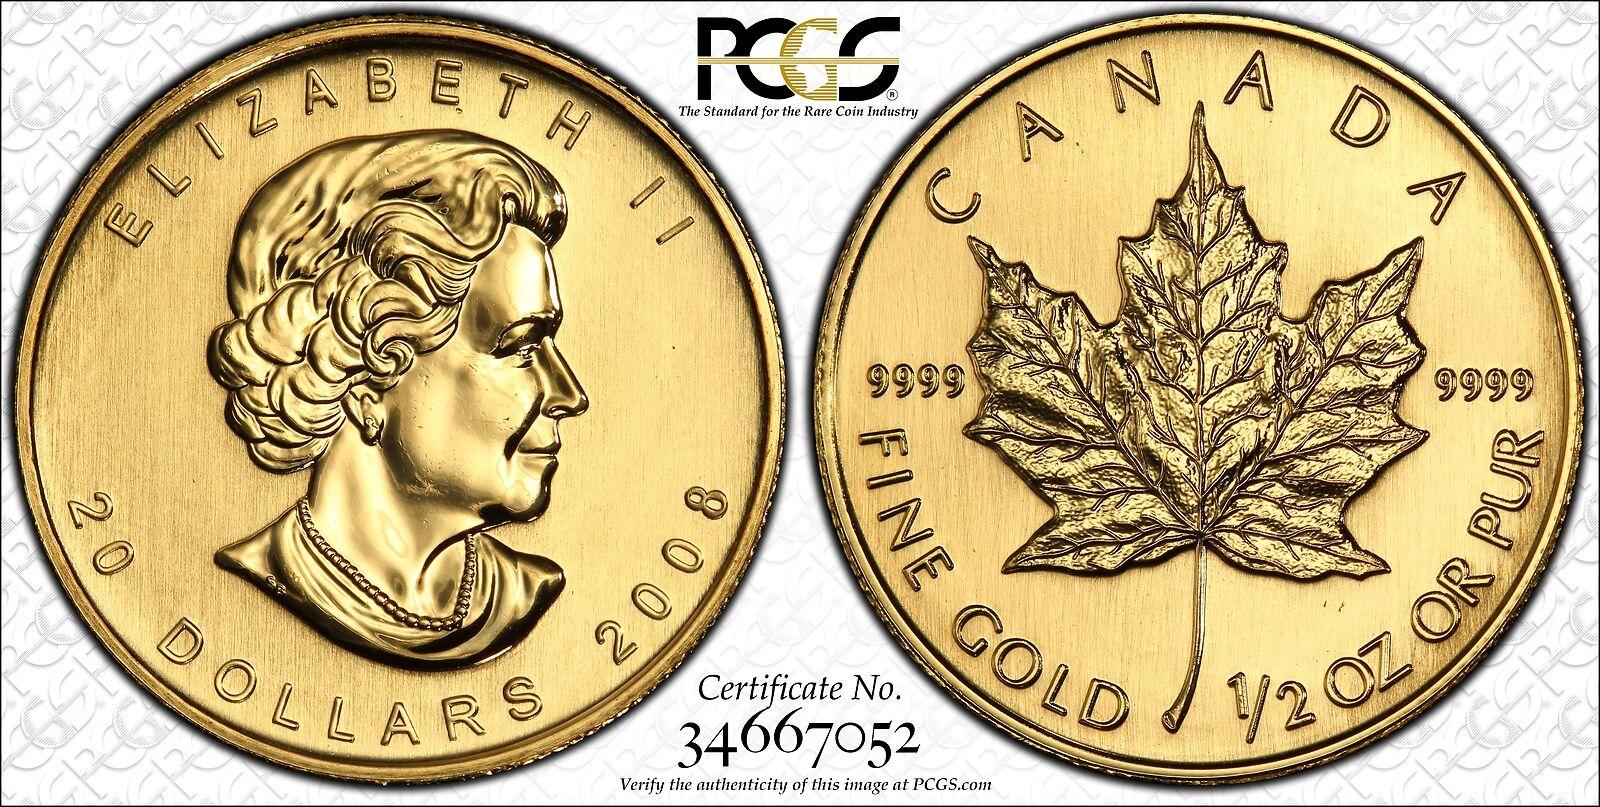 RGS Rare Coins